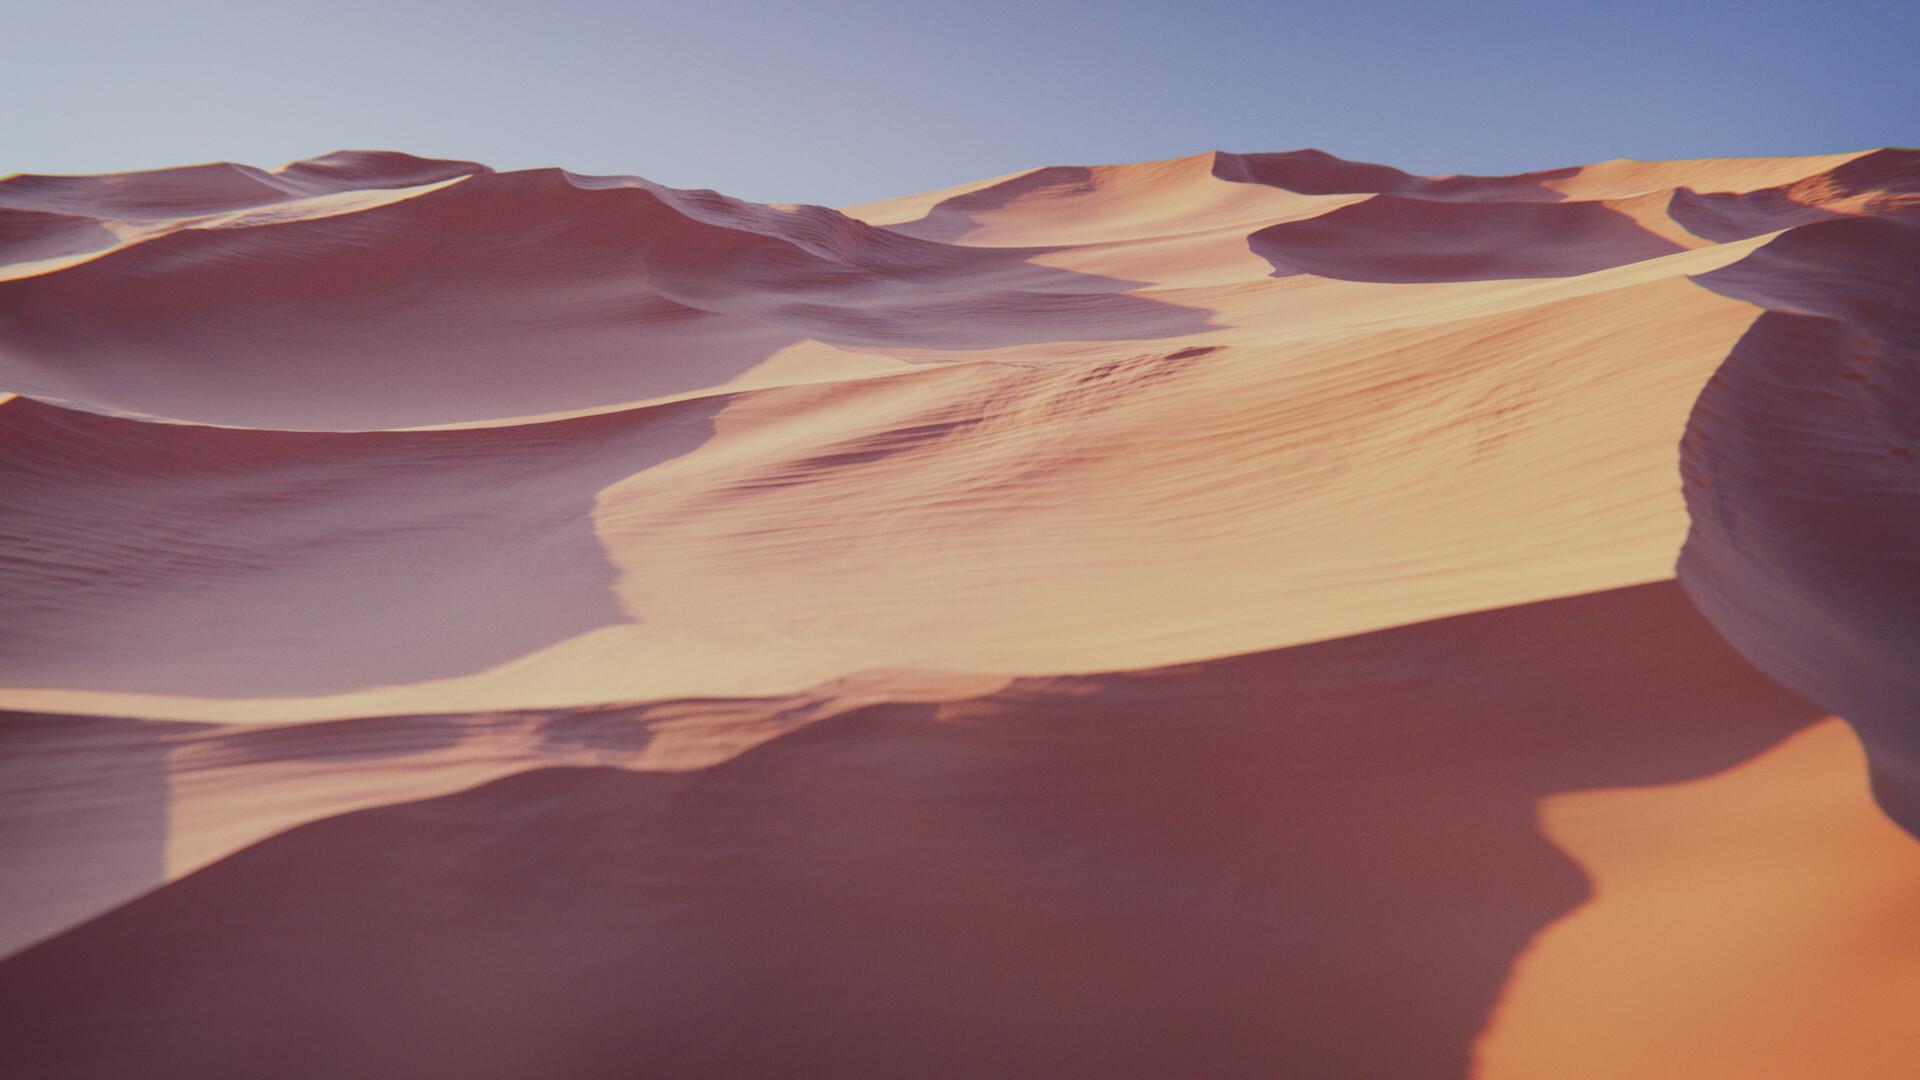 Sand Dune Render 01